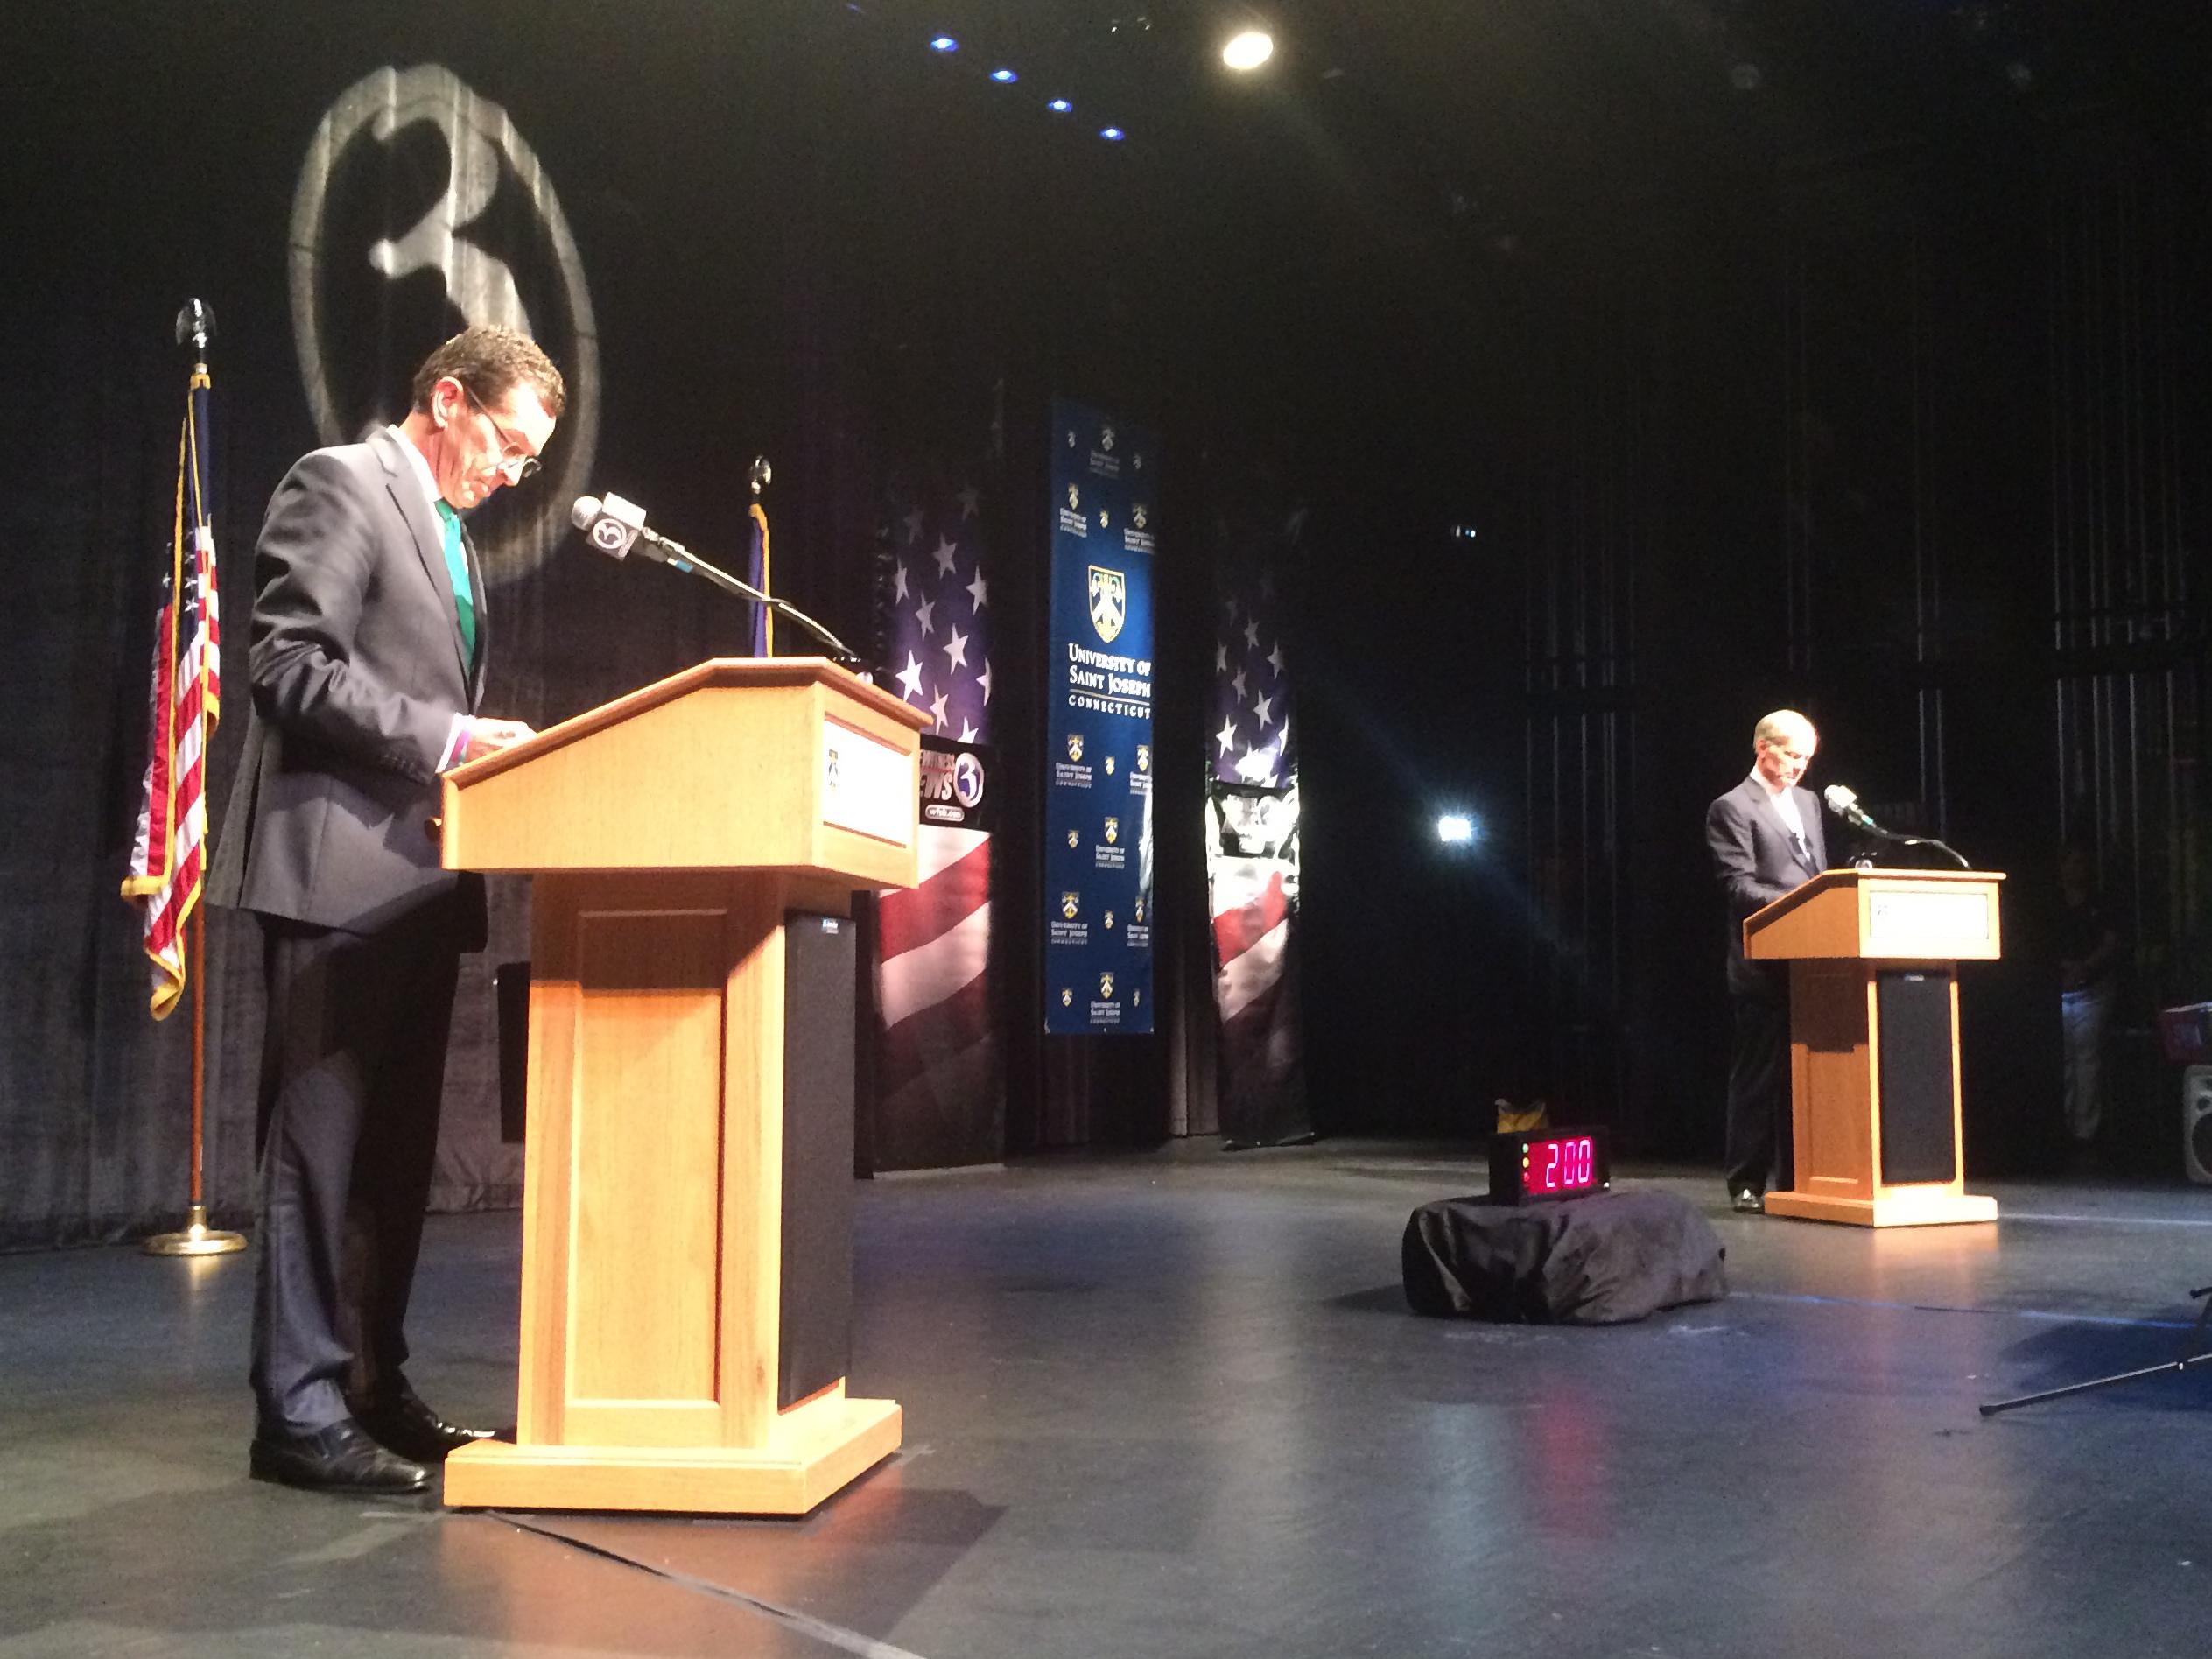 Gov. Dannel P. Malloy checks his notes before the broadcast.